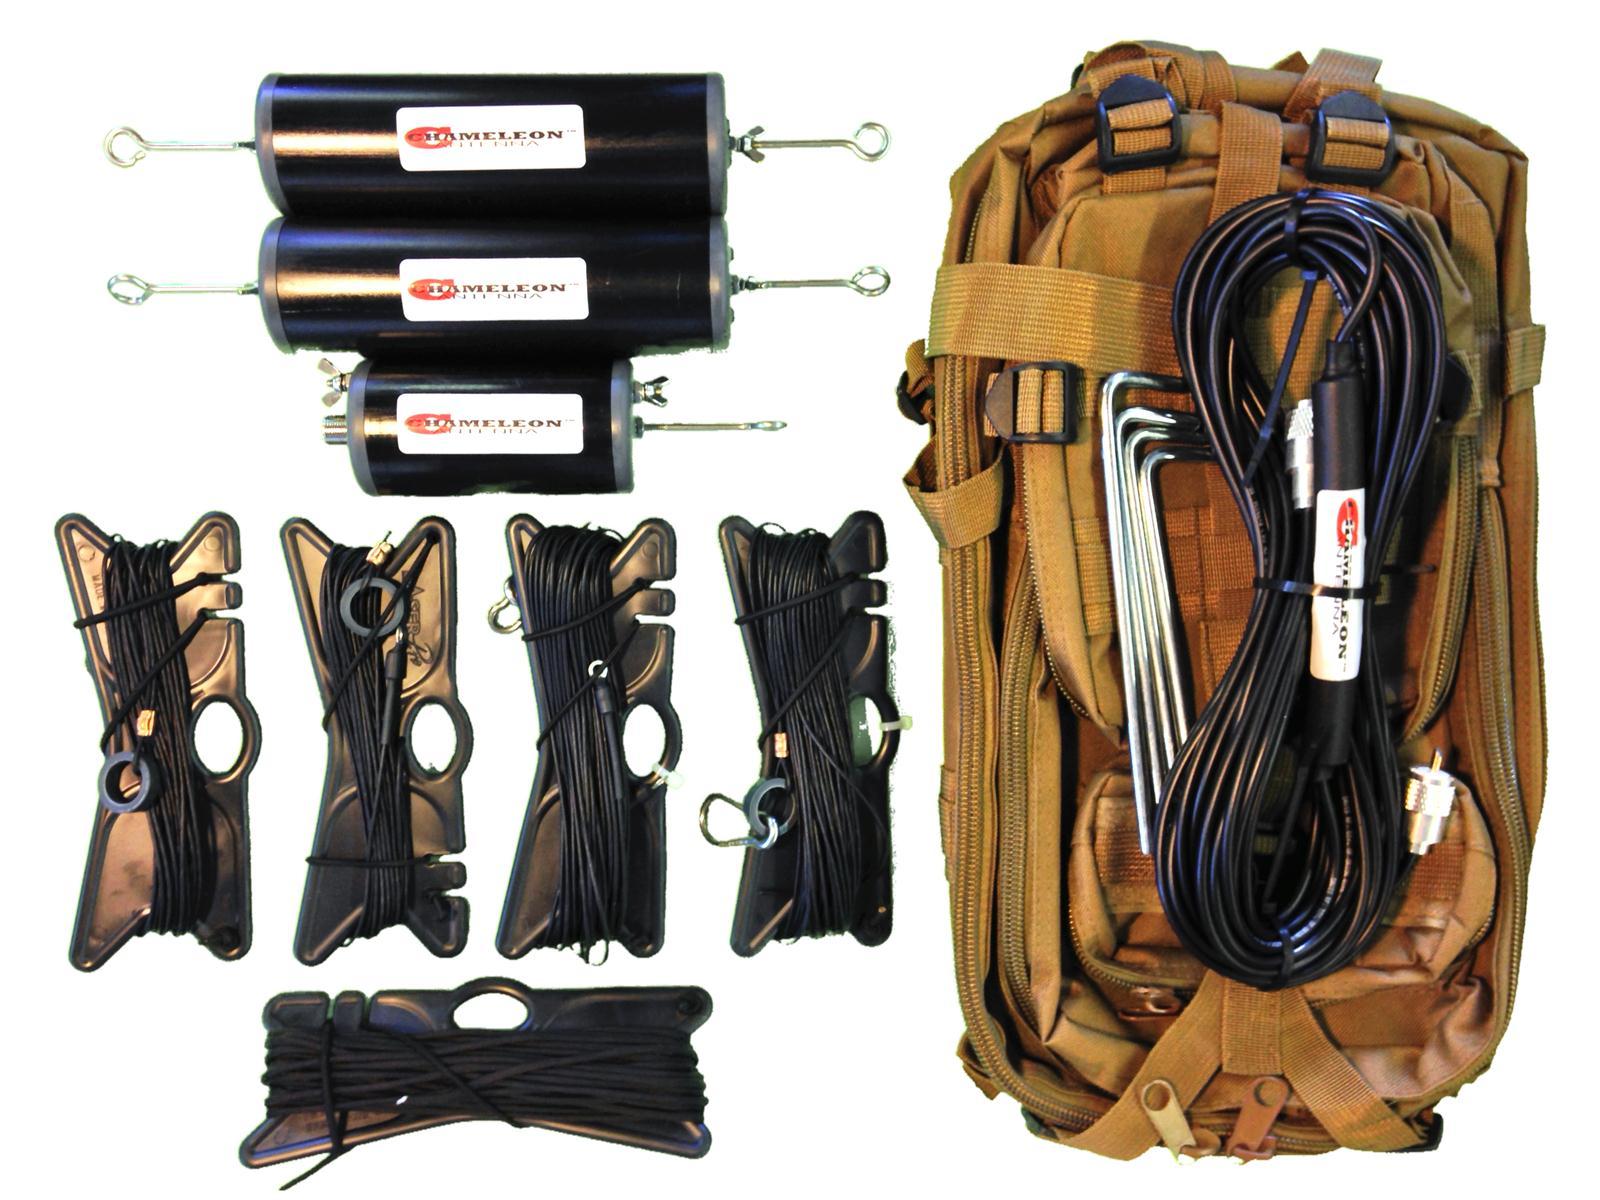 CHAMELEON ANTENNA Portable HF Antennas TD ‹ SPARKY's Blog